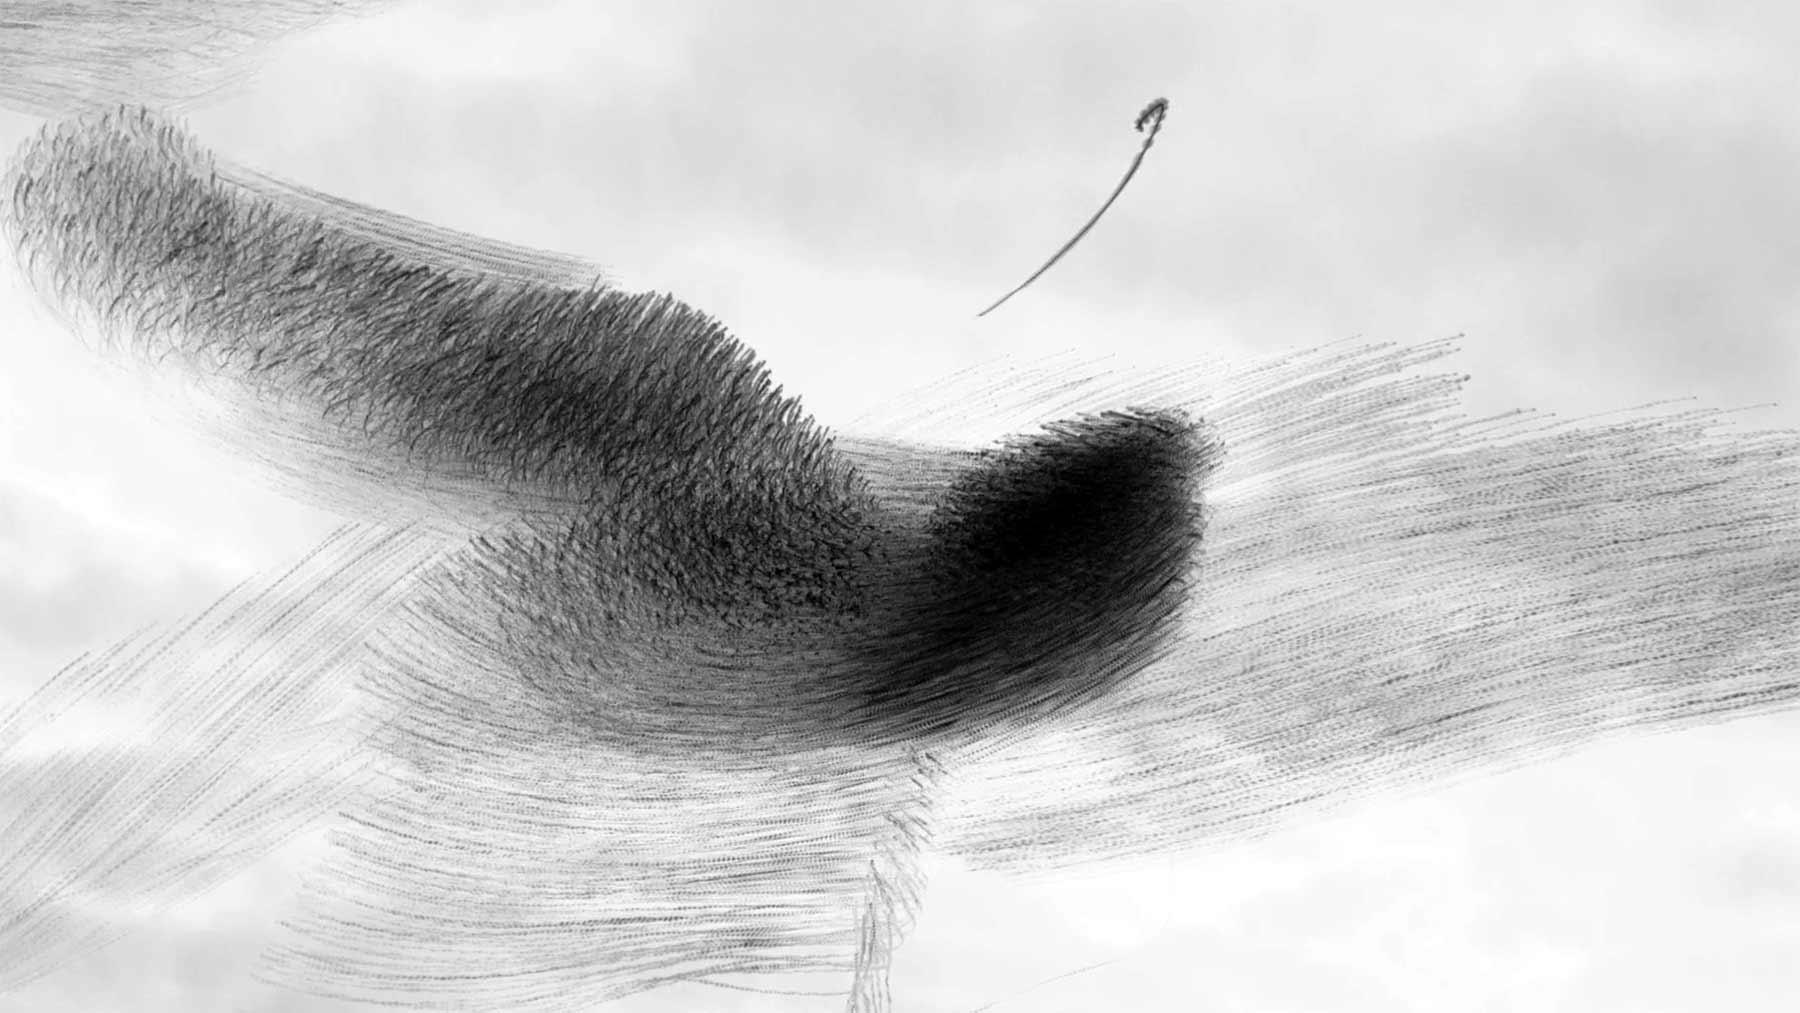 Murmuration: Starenschwarm vs. Adler